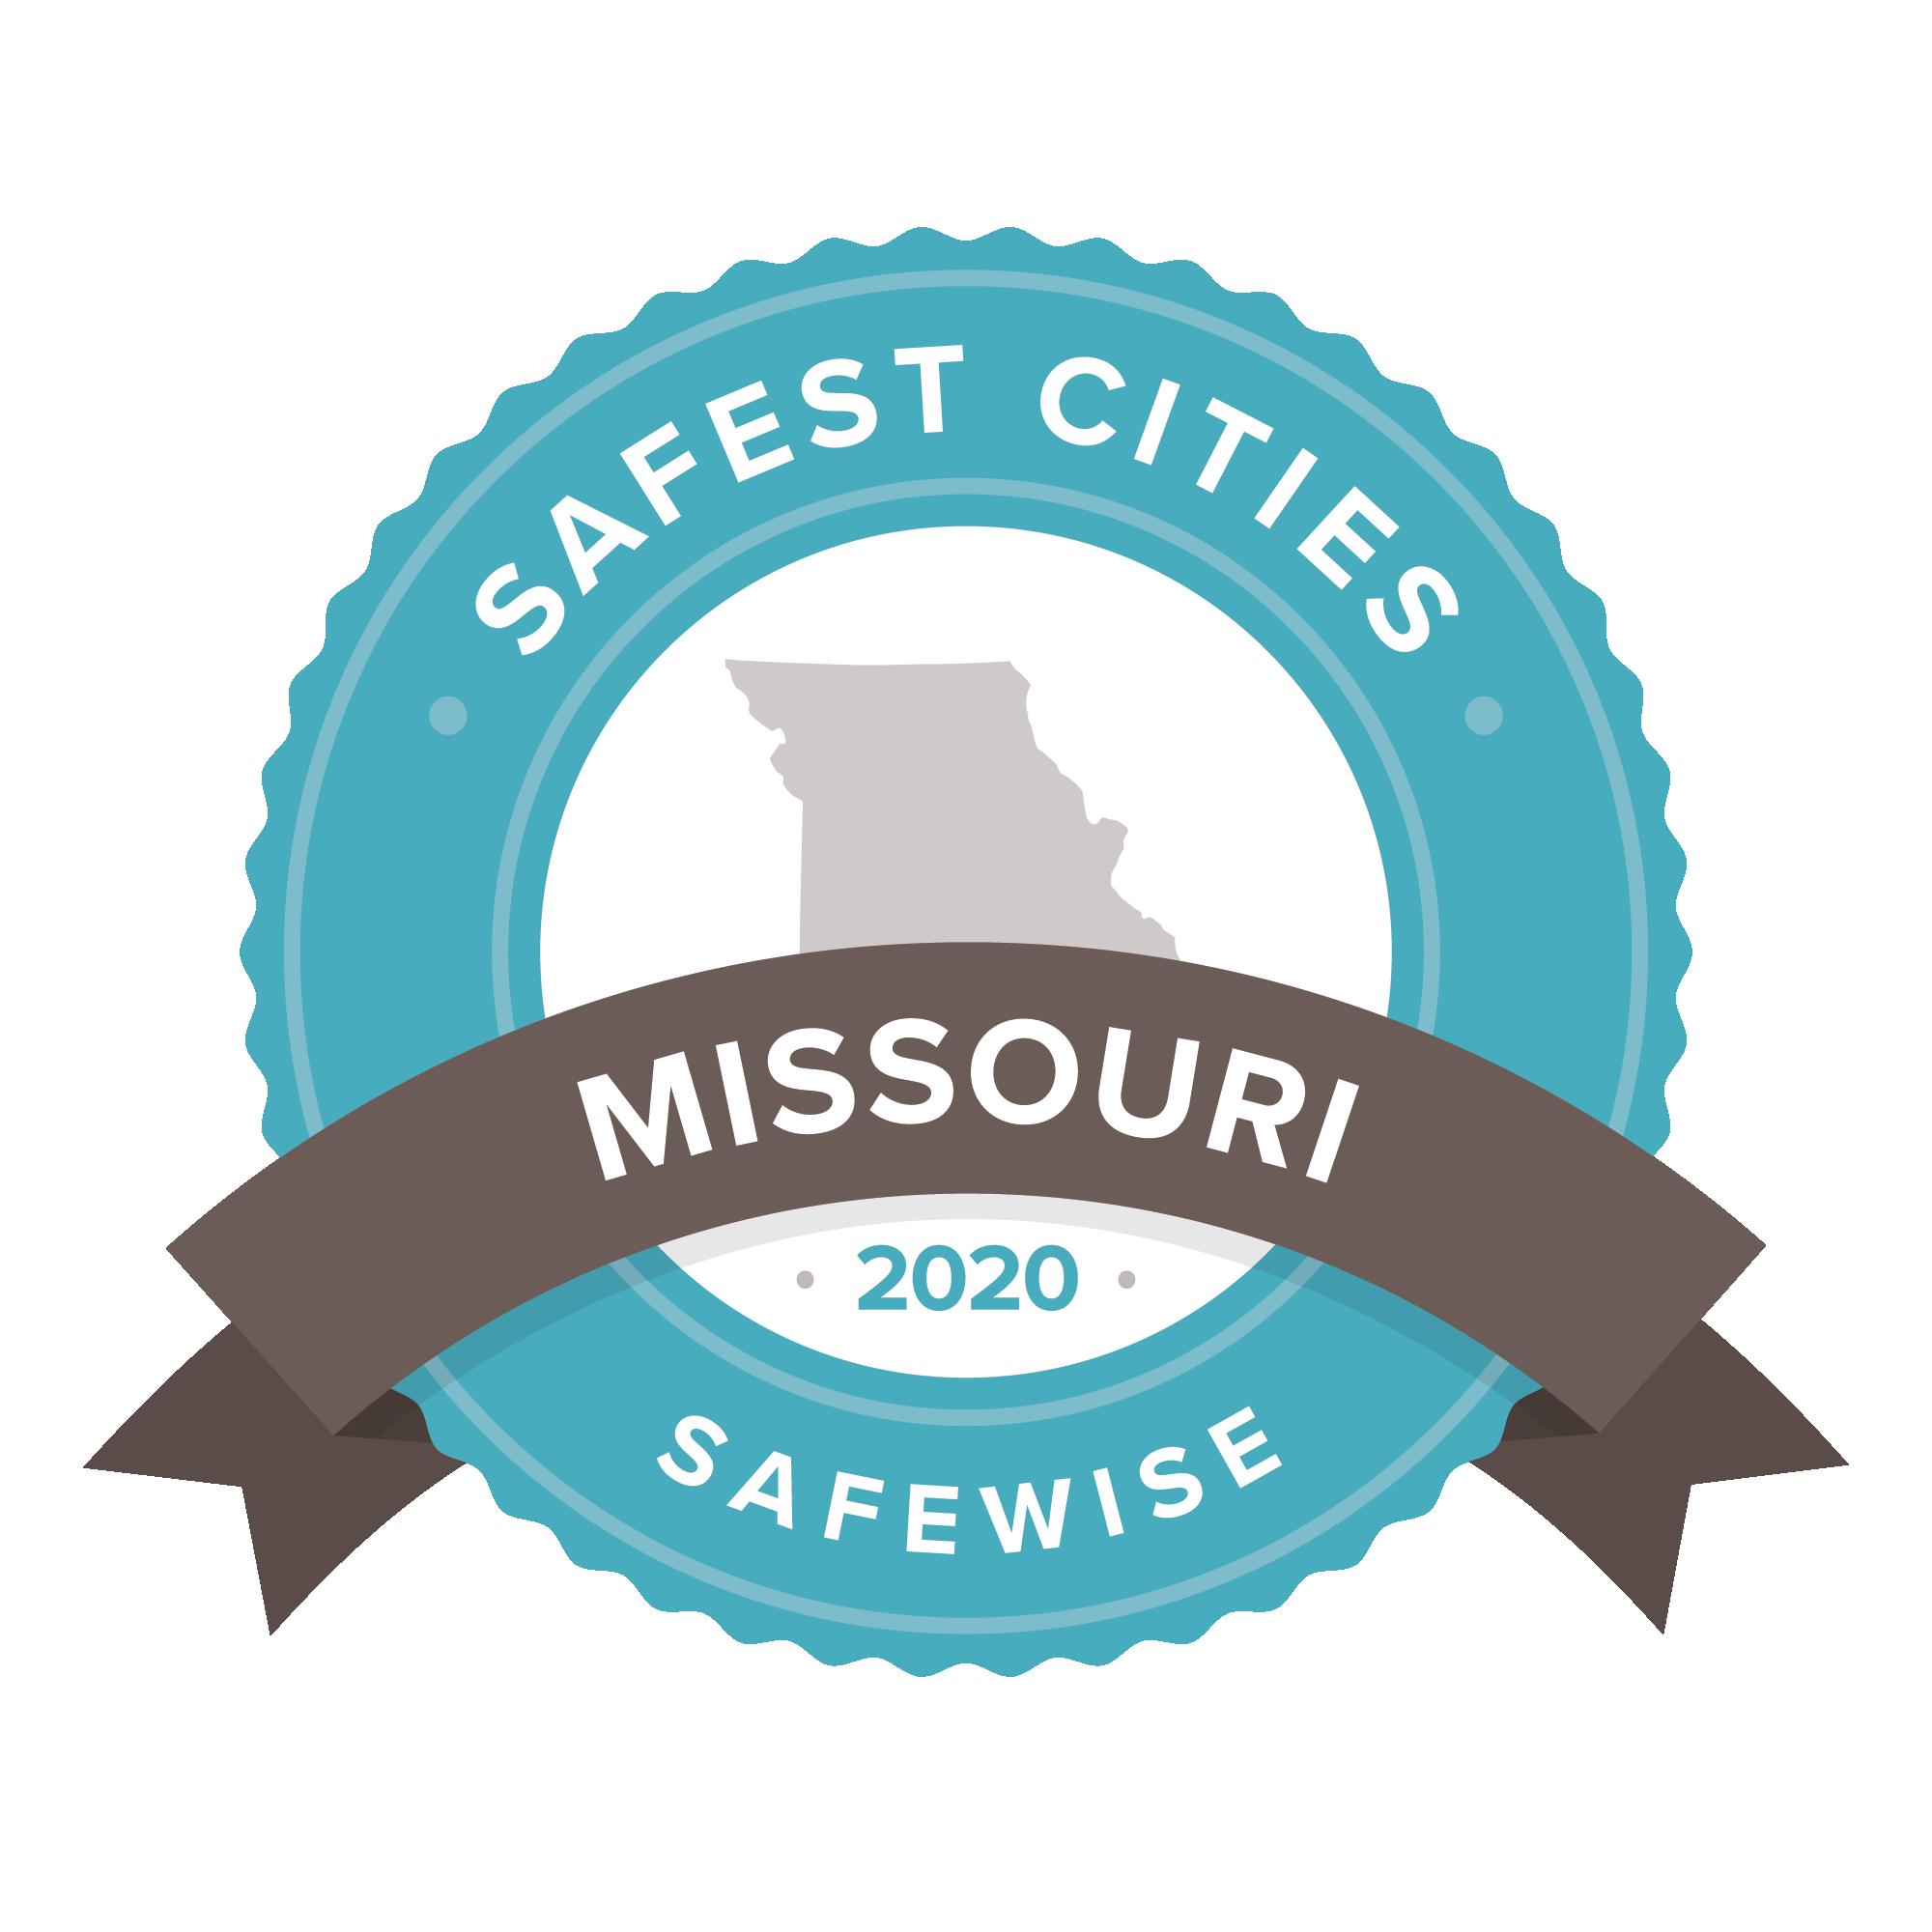 Missouri safest cities badge